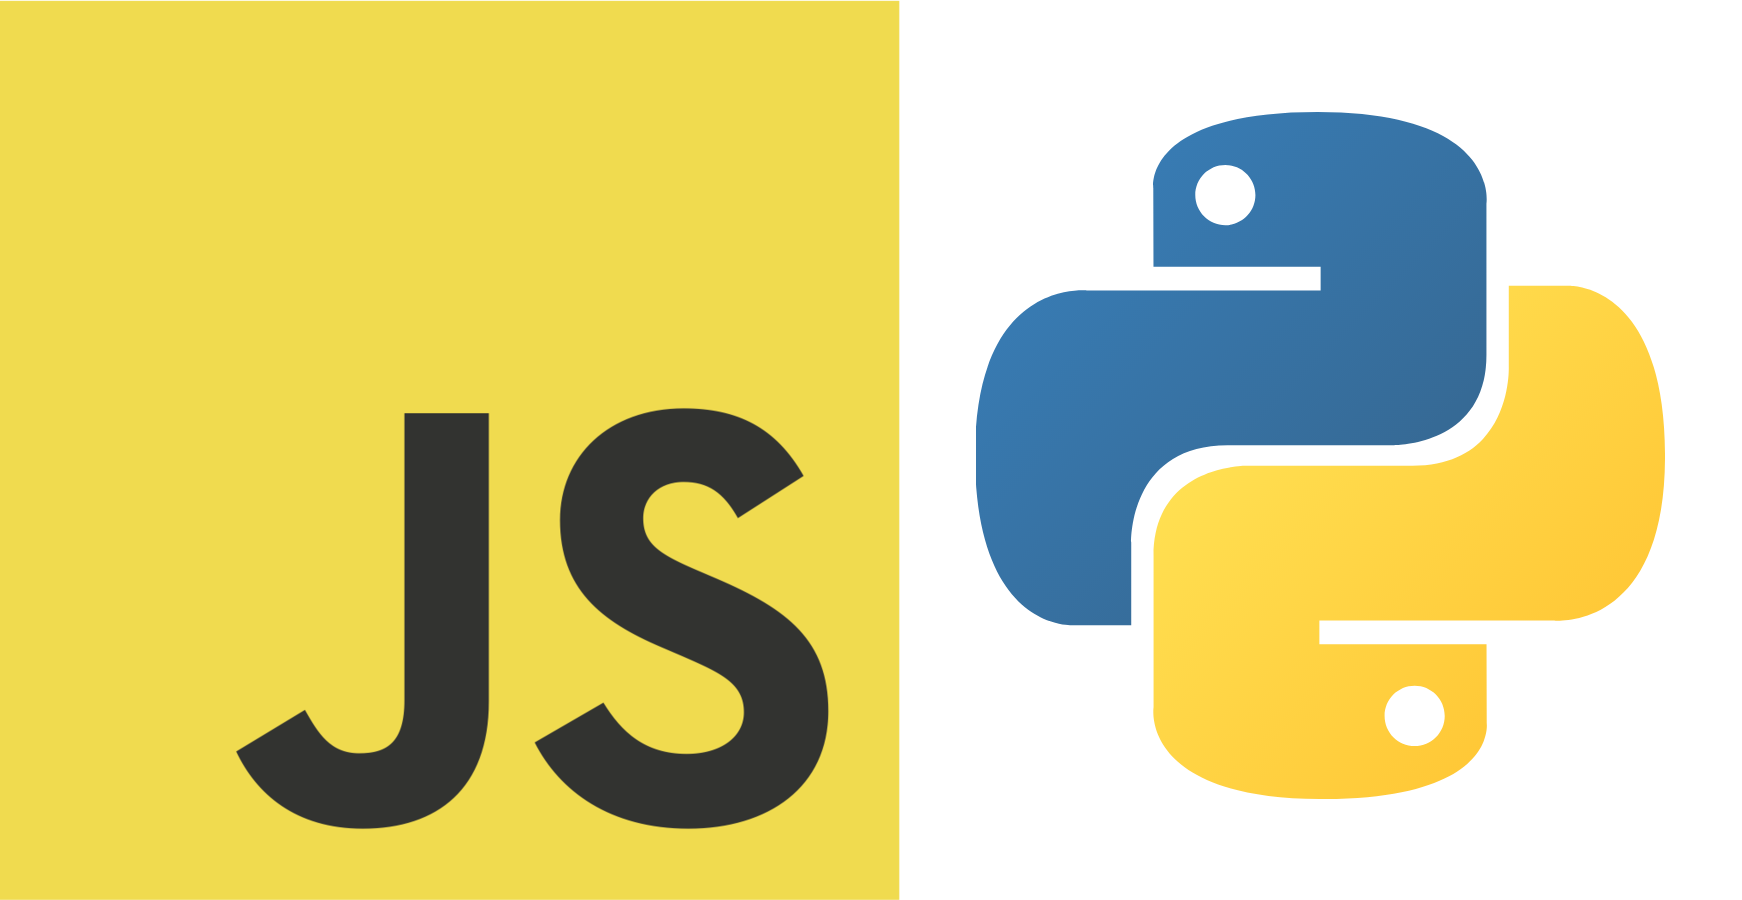 javascript vs python logos